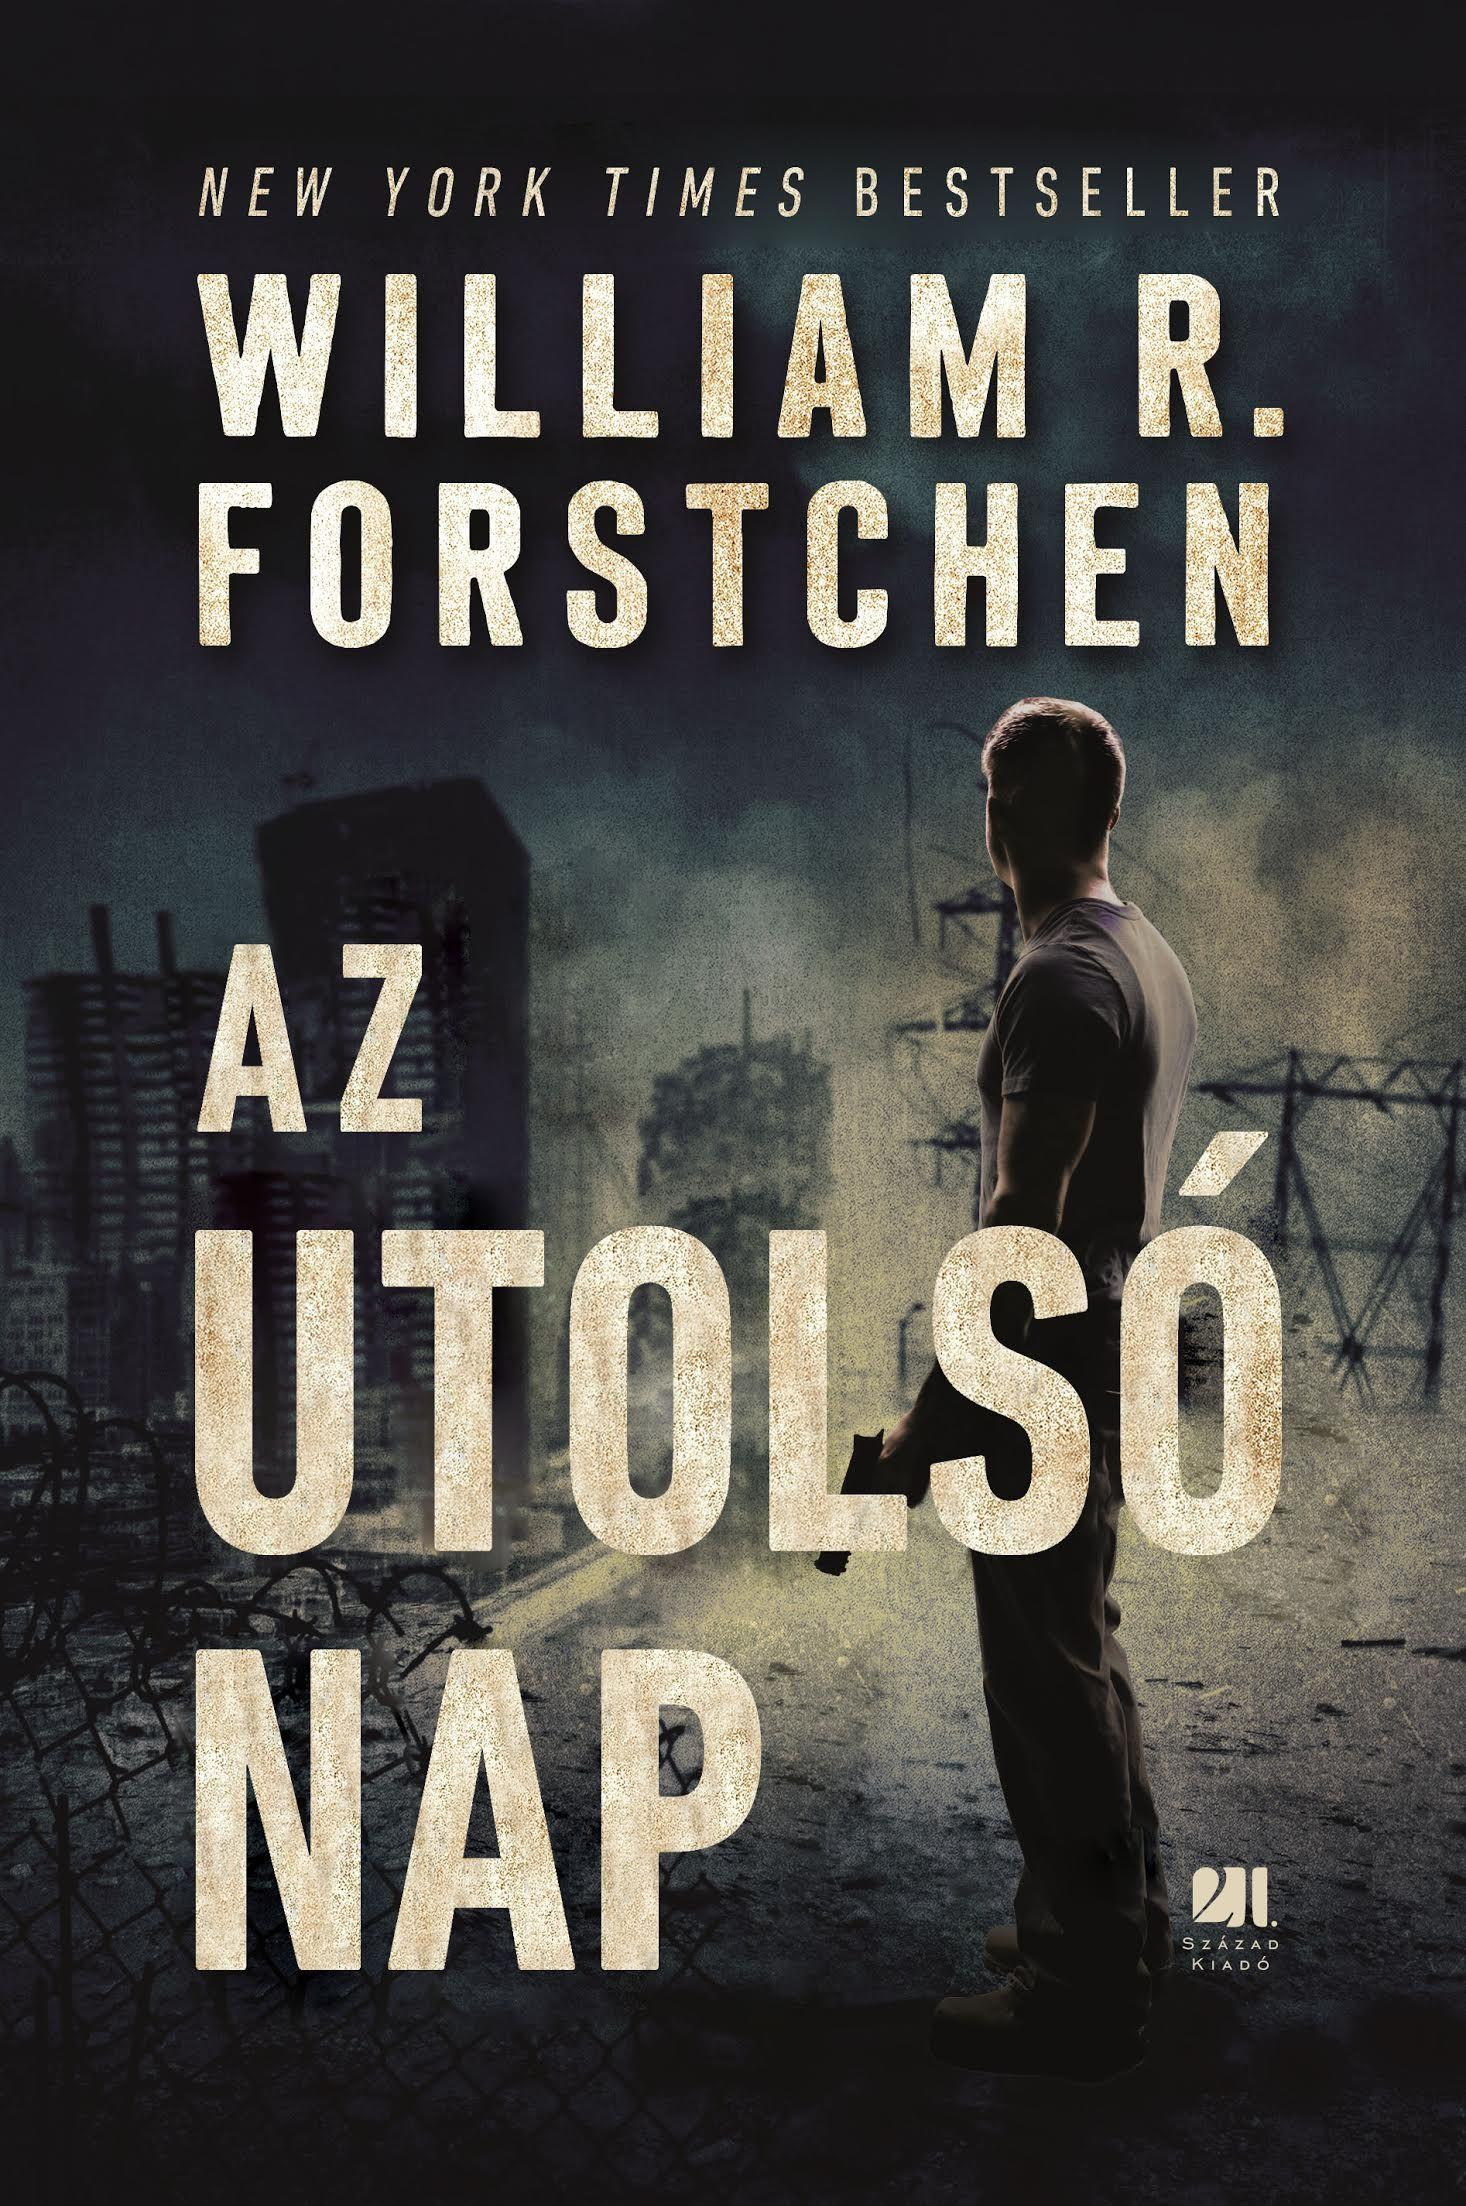 FORSTCHEN, WILLIAM R. - AZ UTOLSÓ NAP